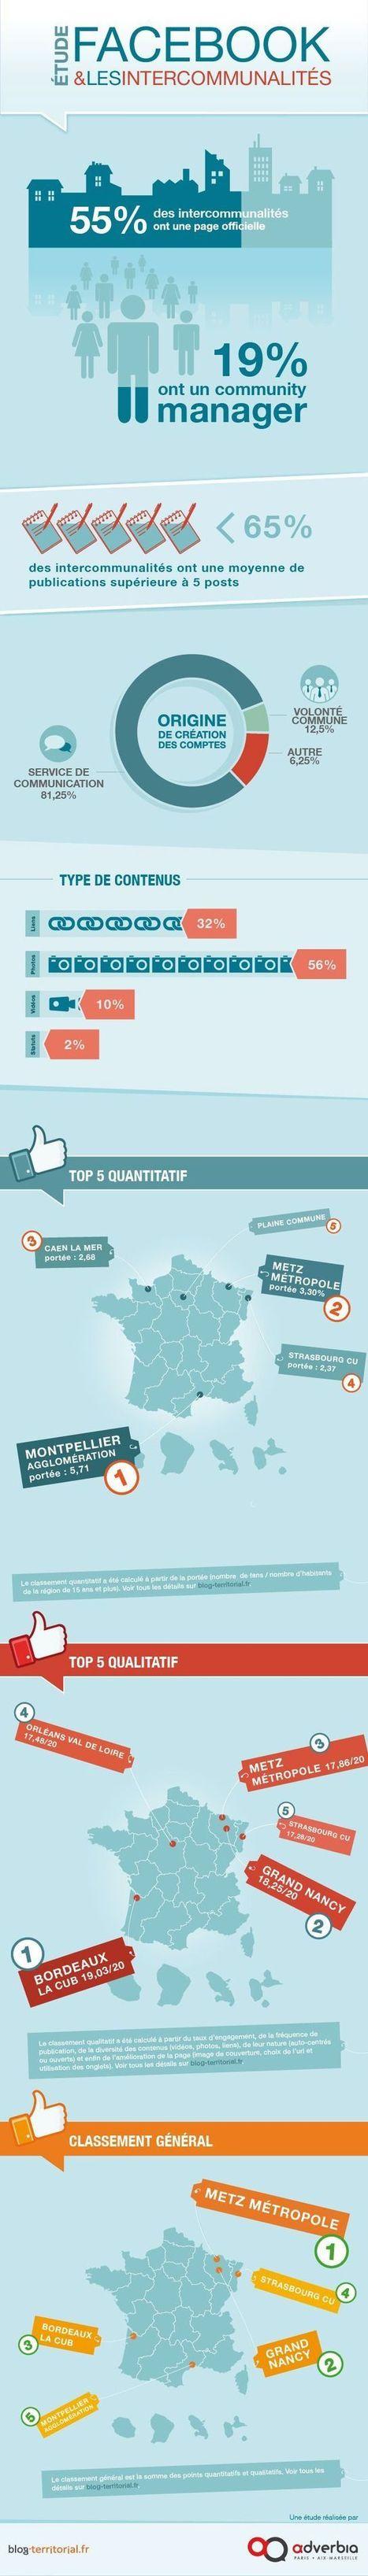 Facebook et les interco | Numérique territorial | Scoop.it